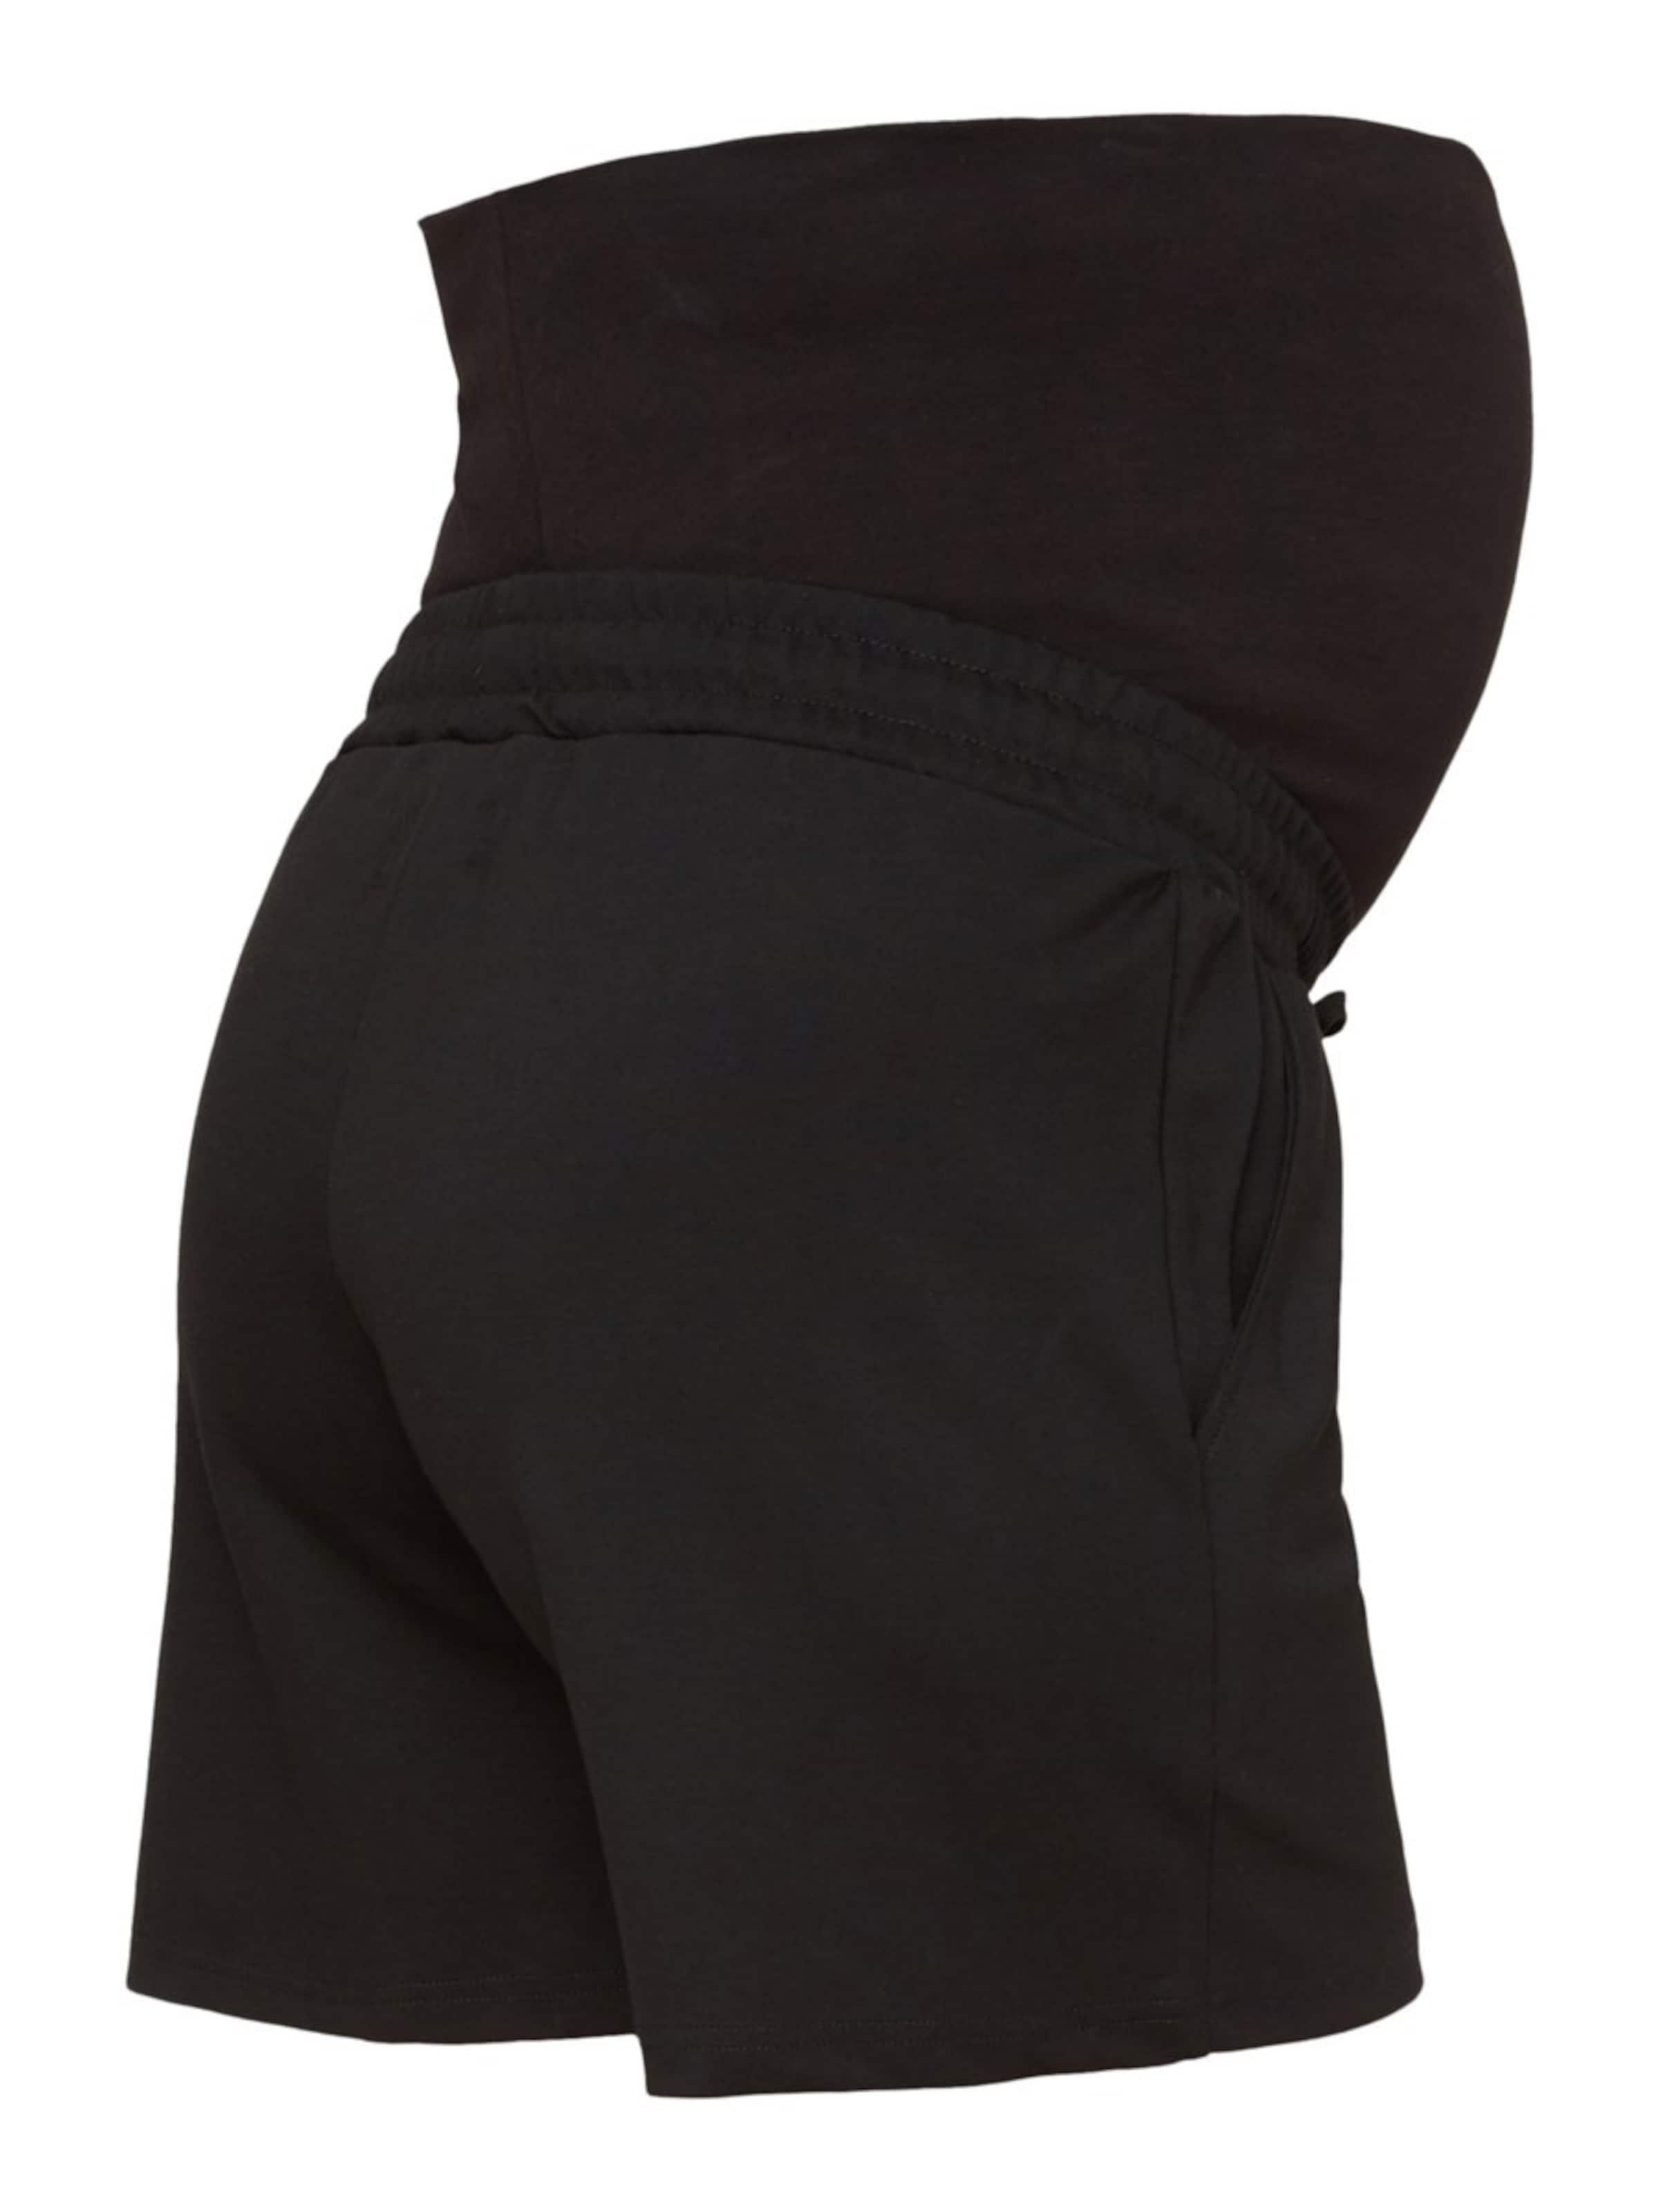 Noir Pantalon Mamalicious Pantalon En Noir Mamalicious Mamalicious Pantalon Mamalicious En Noir En Pantalon PXTkiOZu